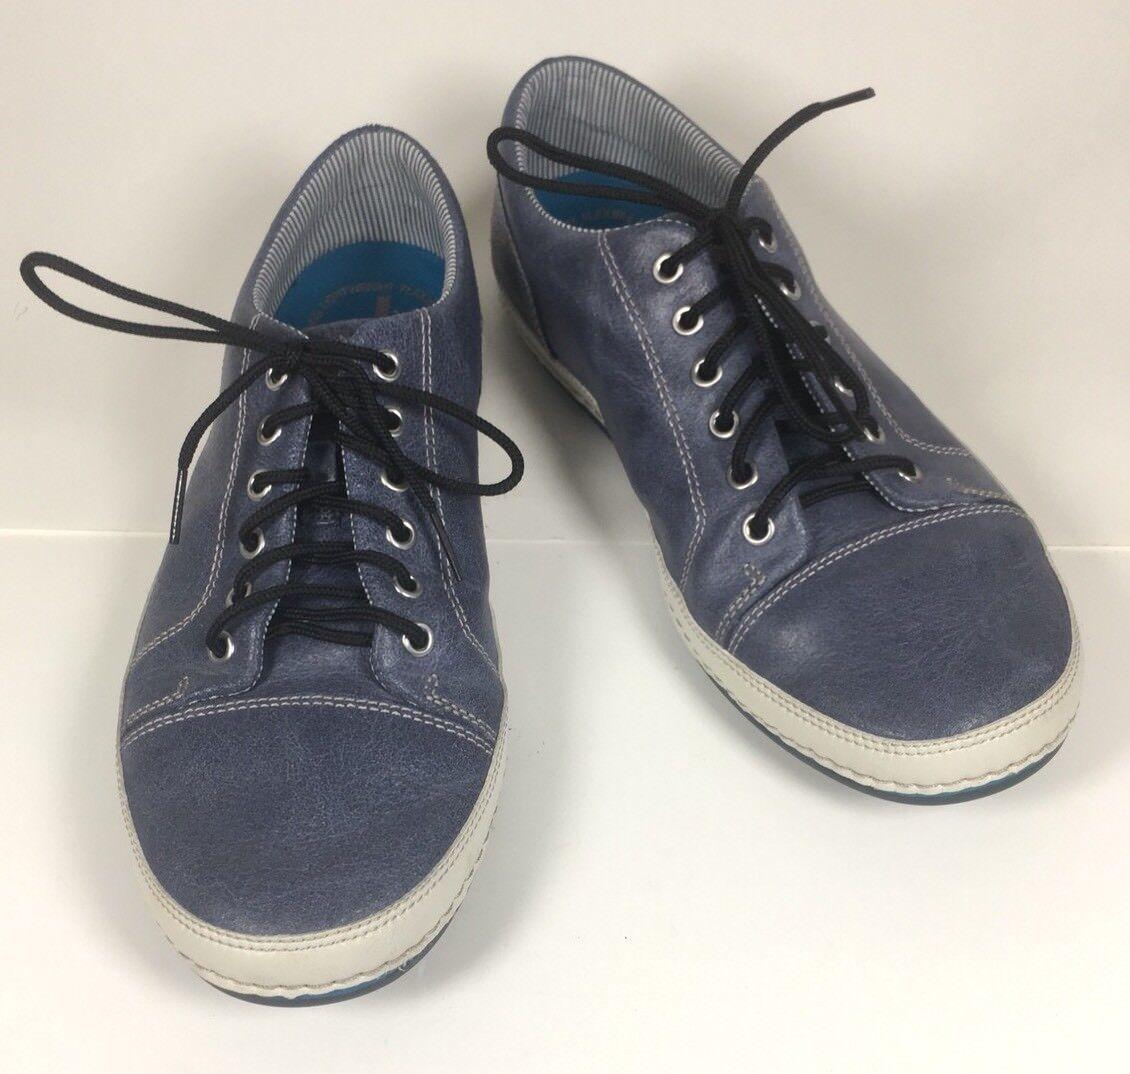 Rockport bluee Lace-up Deck-Boat-Tennis shoes Men's 7M Leather Upper V78271